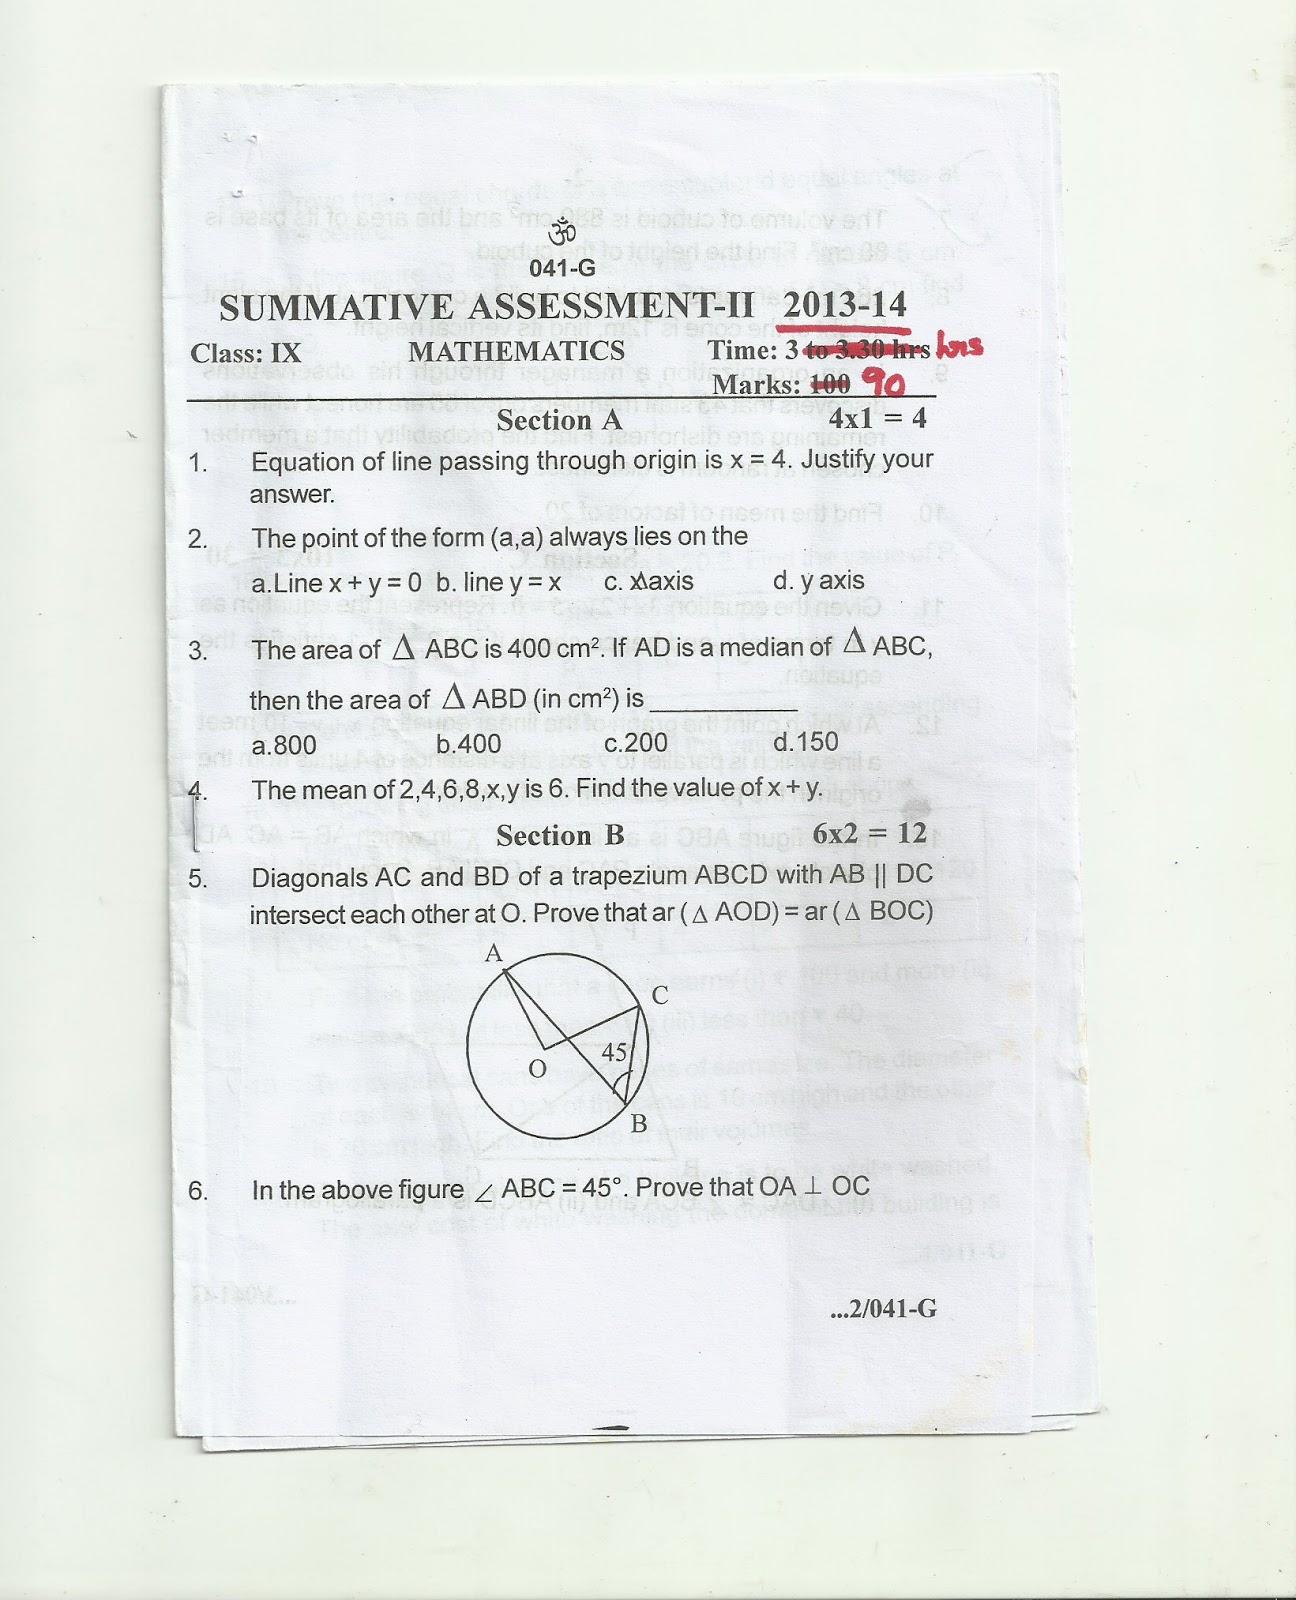 Posted By Subha Natarajan At 07:51 Noments: Cbse Class Ix & X Mathematics